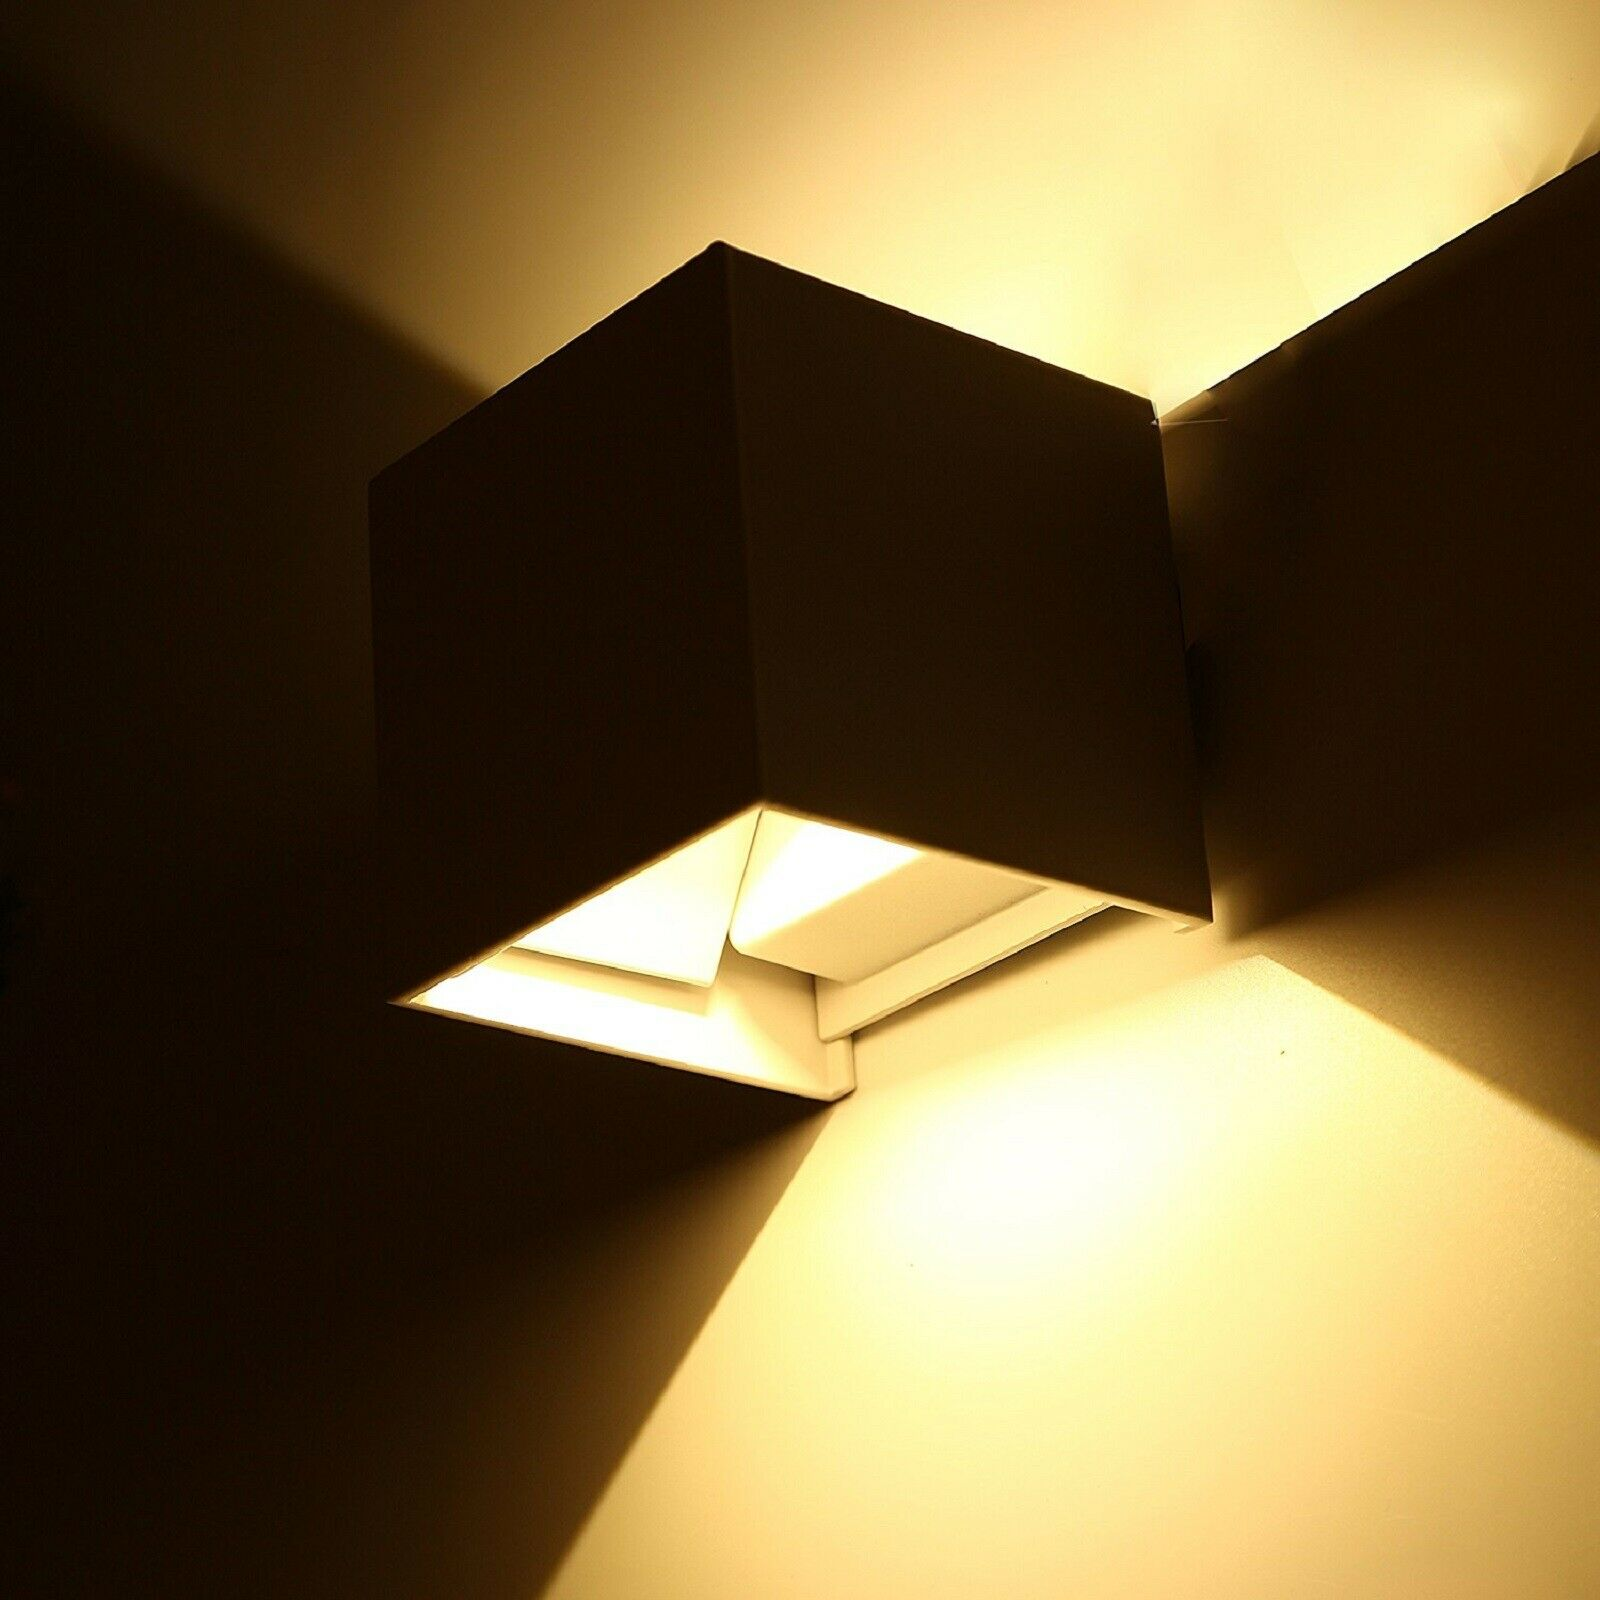 Applique cubo lampada parete luce led regolabile biemissione 6w 10w 40w IP65